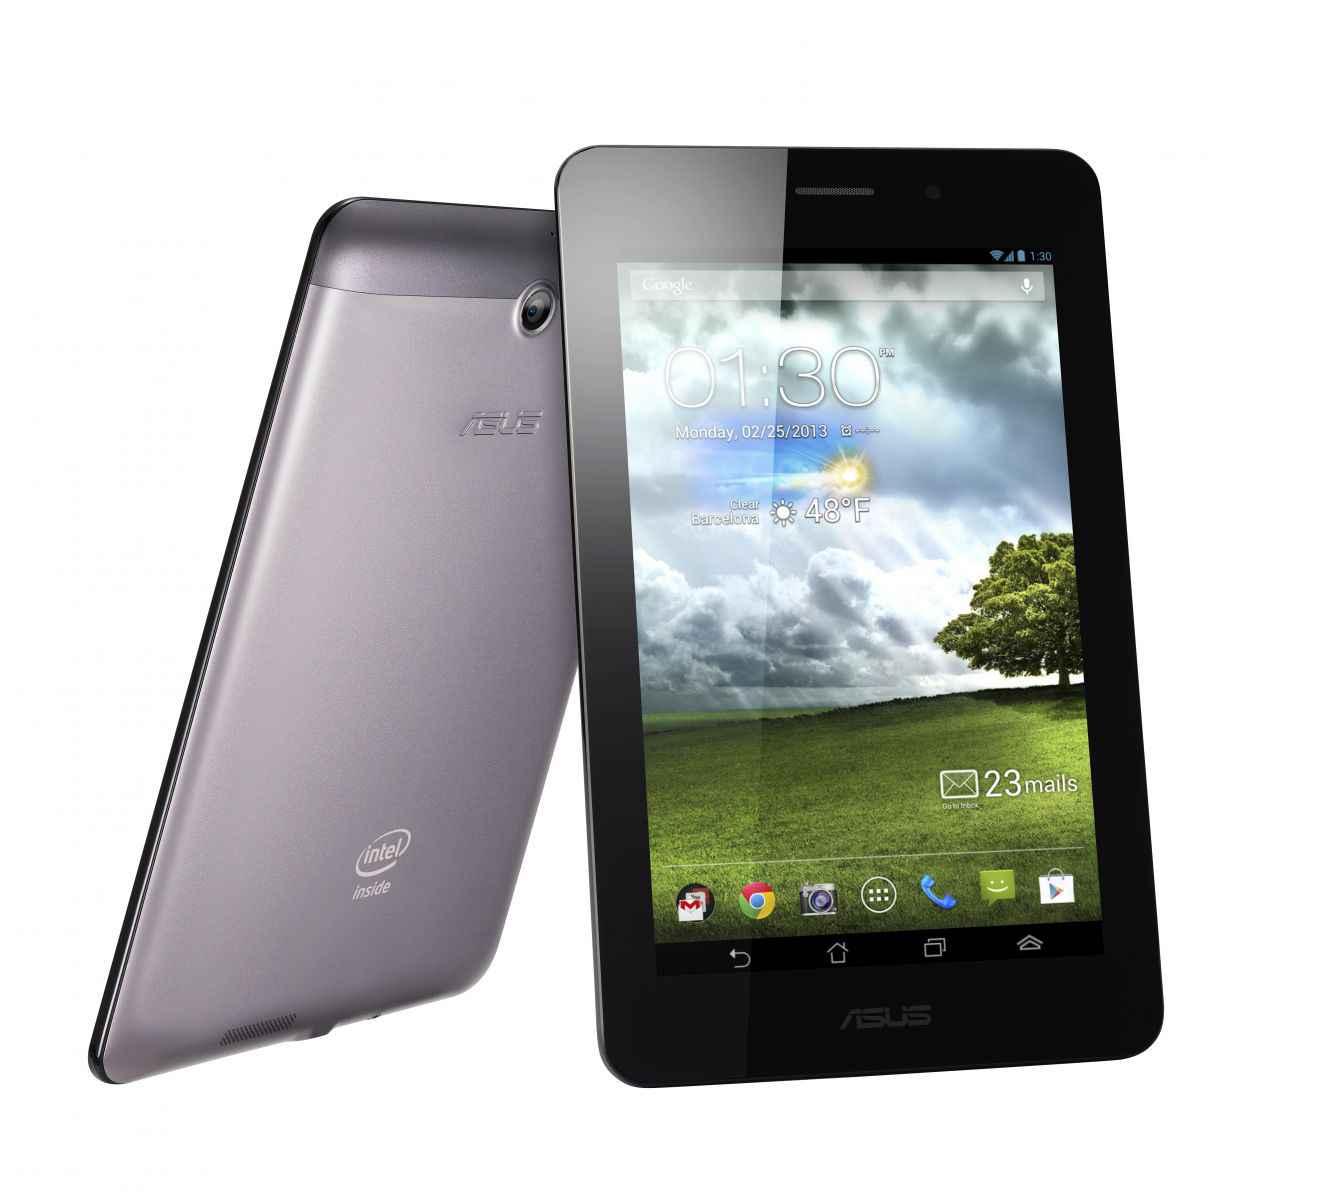 Tablet Asus Fonepad para comprar no Brasil barato